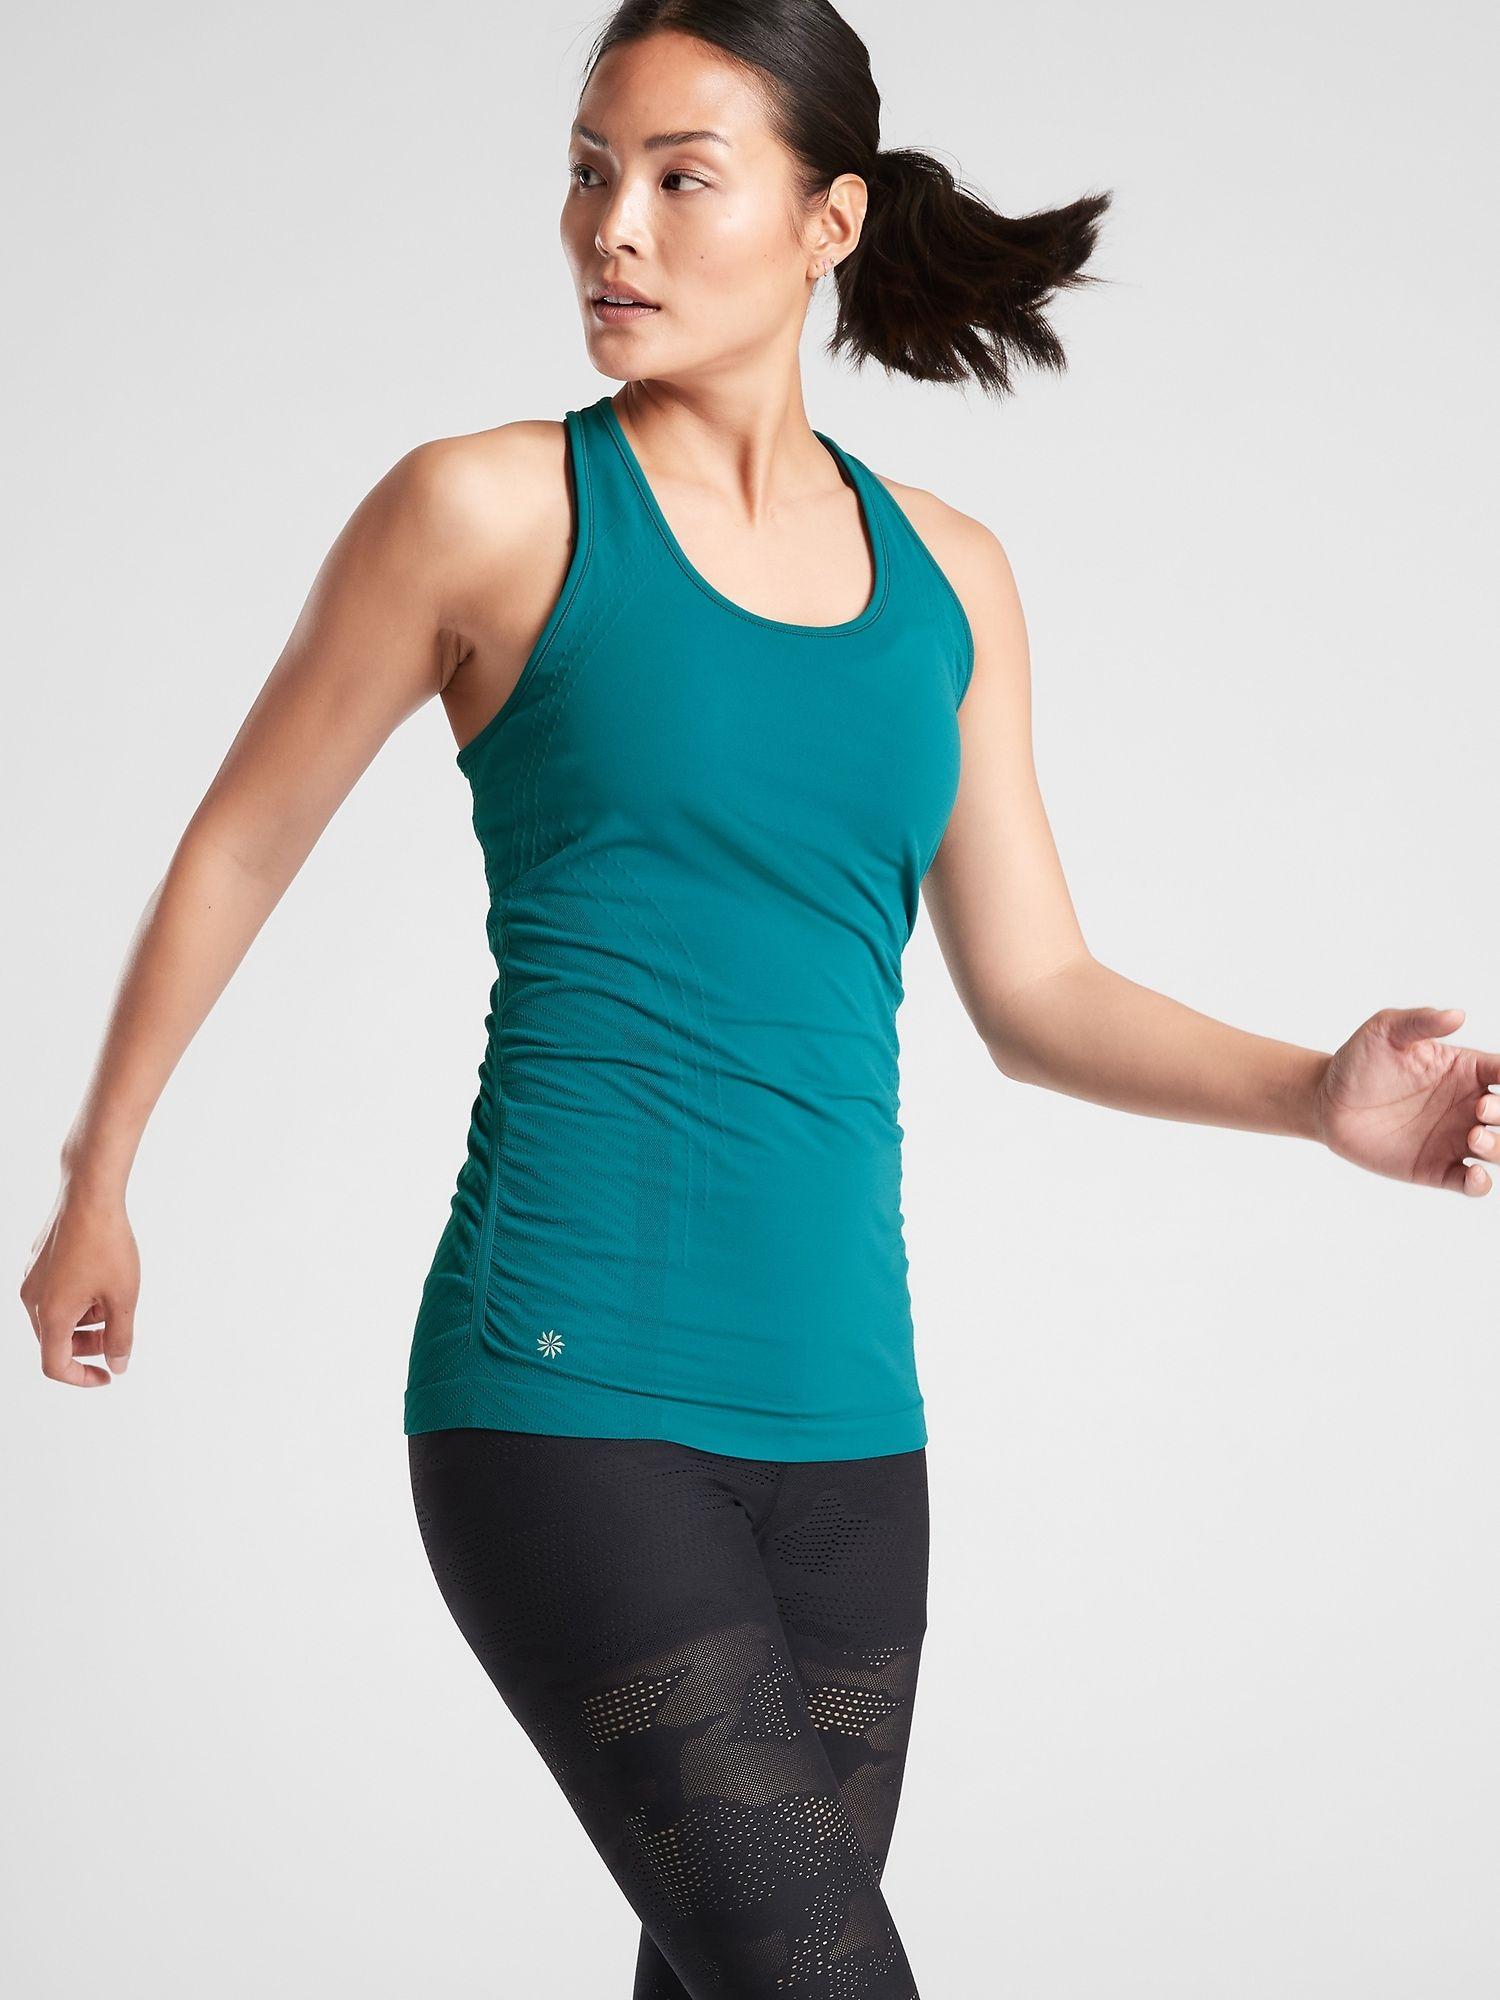 Speedlight Tank Athleta Athletic tank tops, Women, Fashion